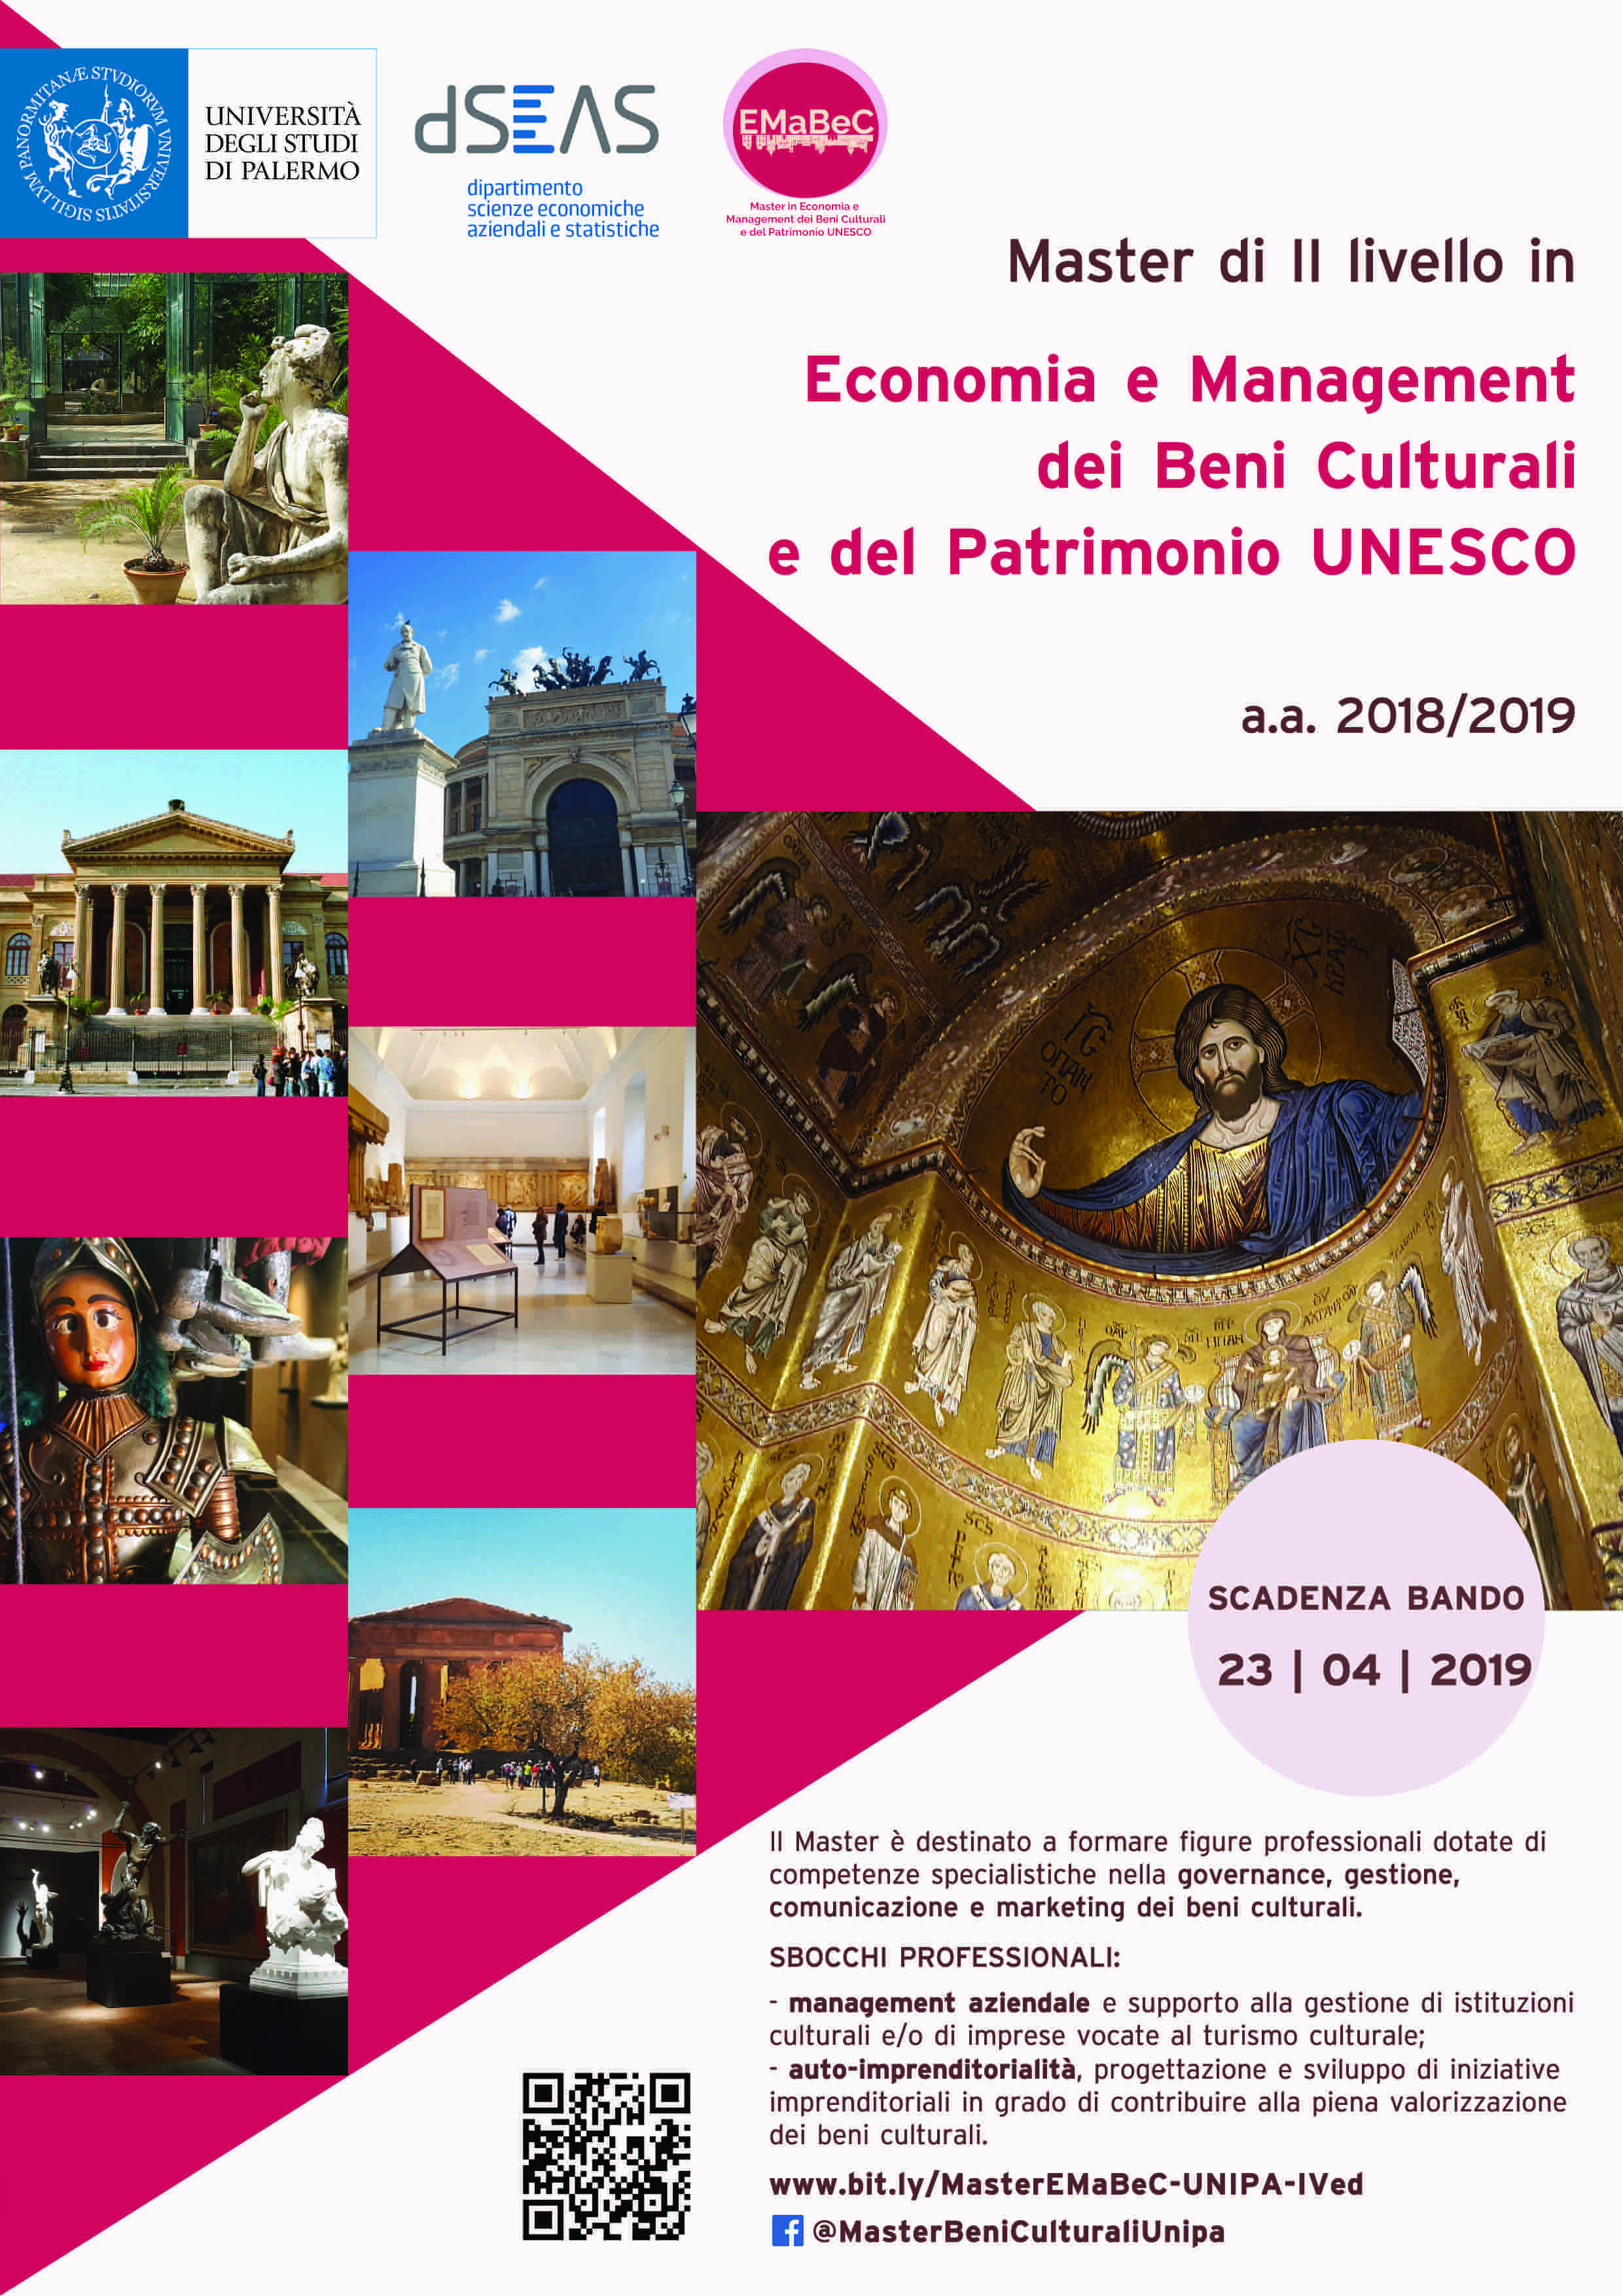 2019_MasterEMABEC-UNESCO-IV_edizione.jpg - 1,006.45 kB